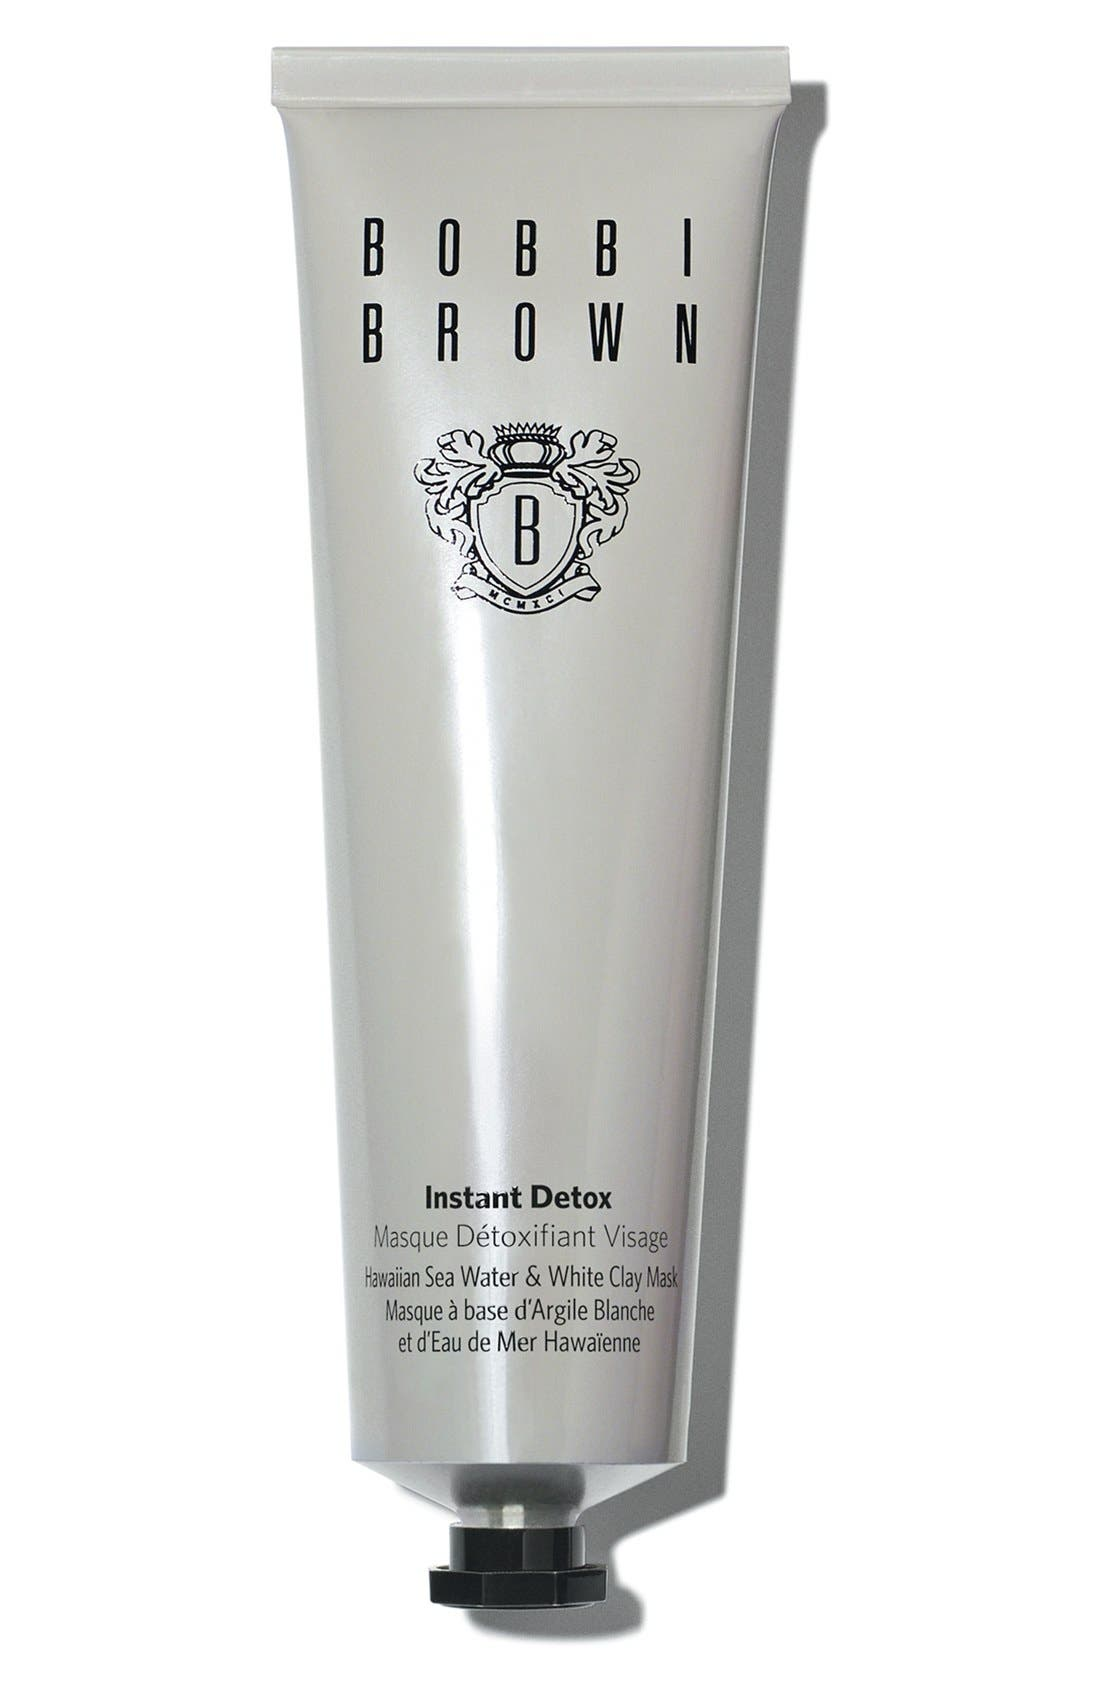 BOBBI BROWN,                             Instant Detox Face Mask,                             Main thumbnail 1, color,                             NO COLOR